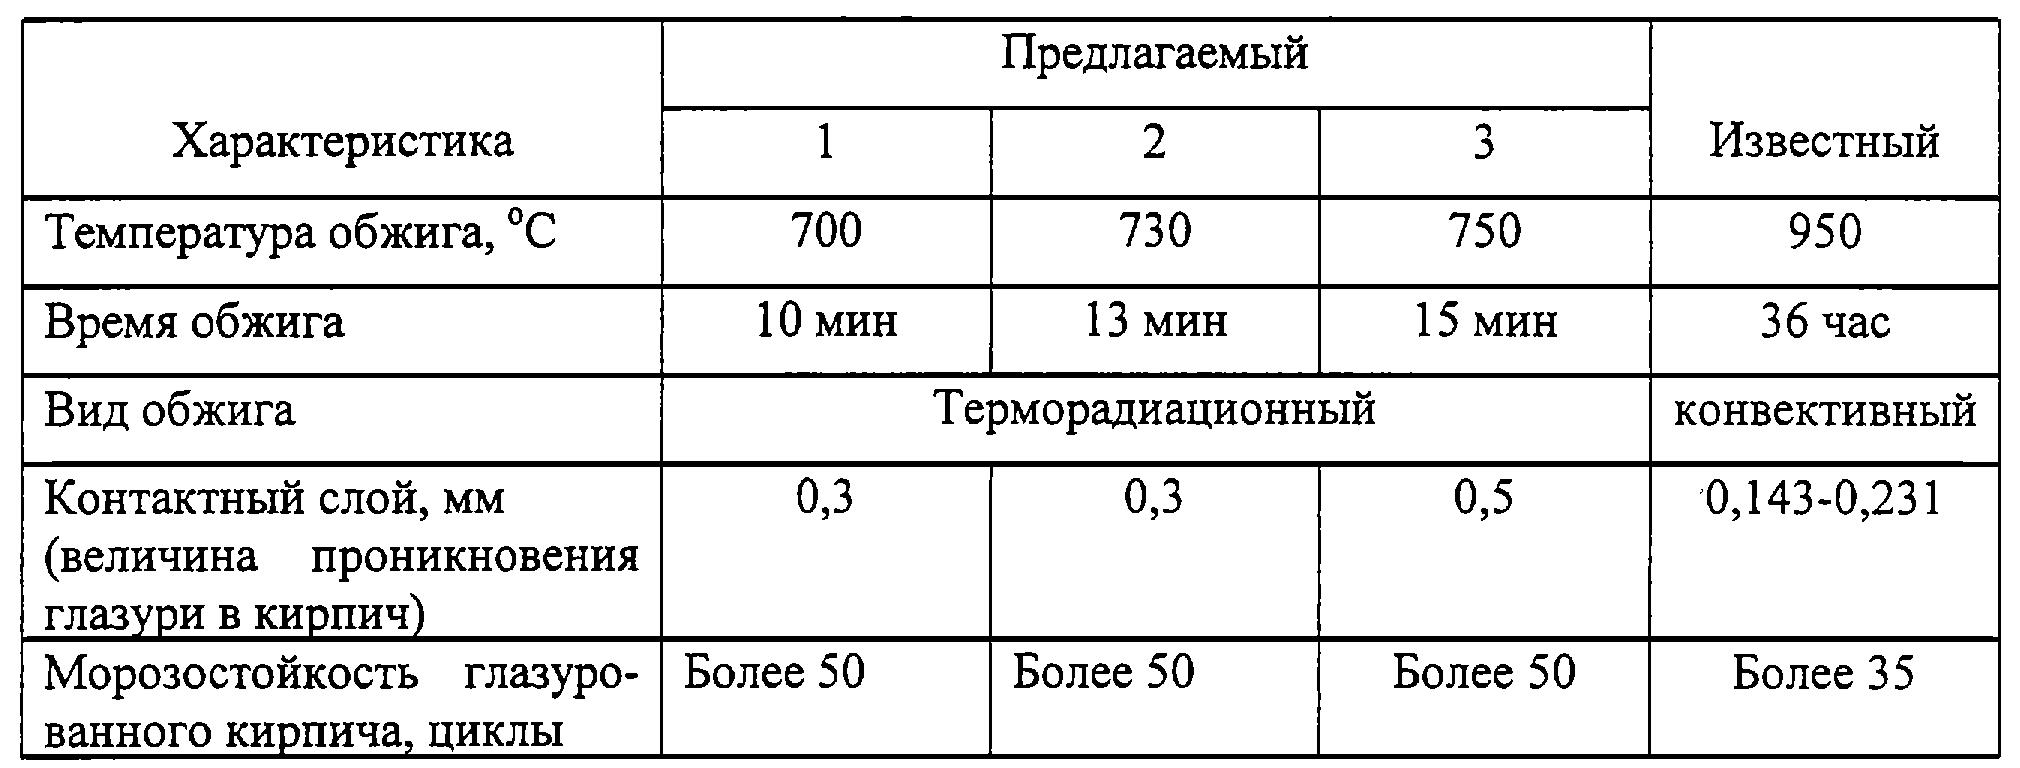 температура обжига силикатного кирпича